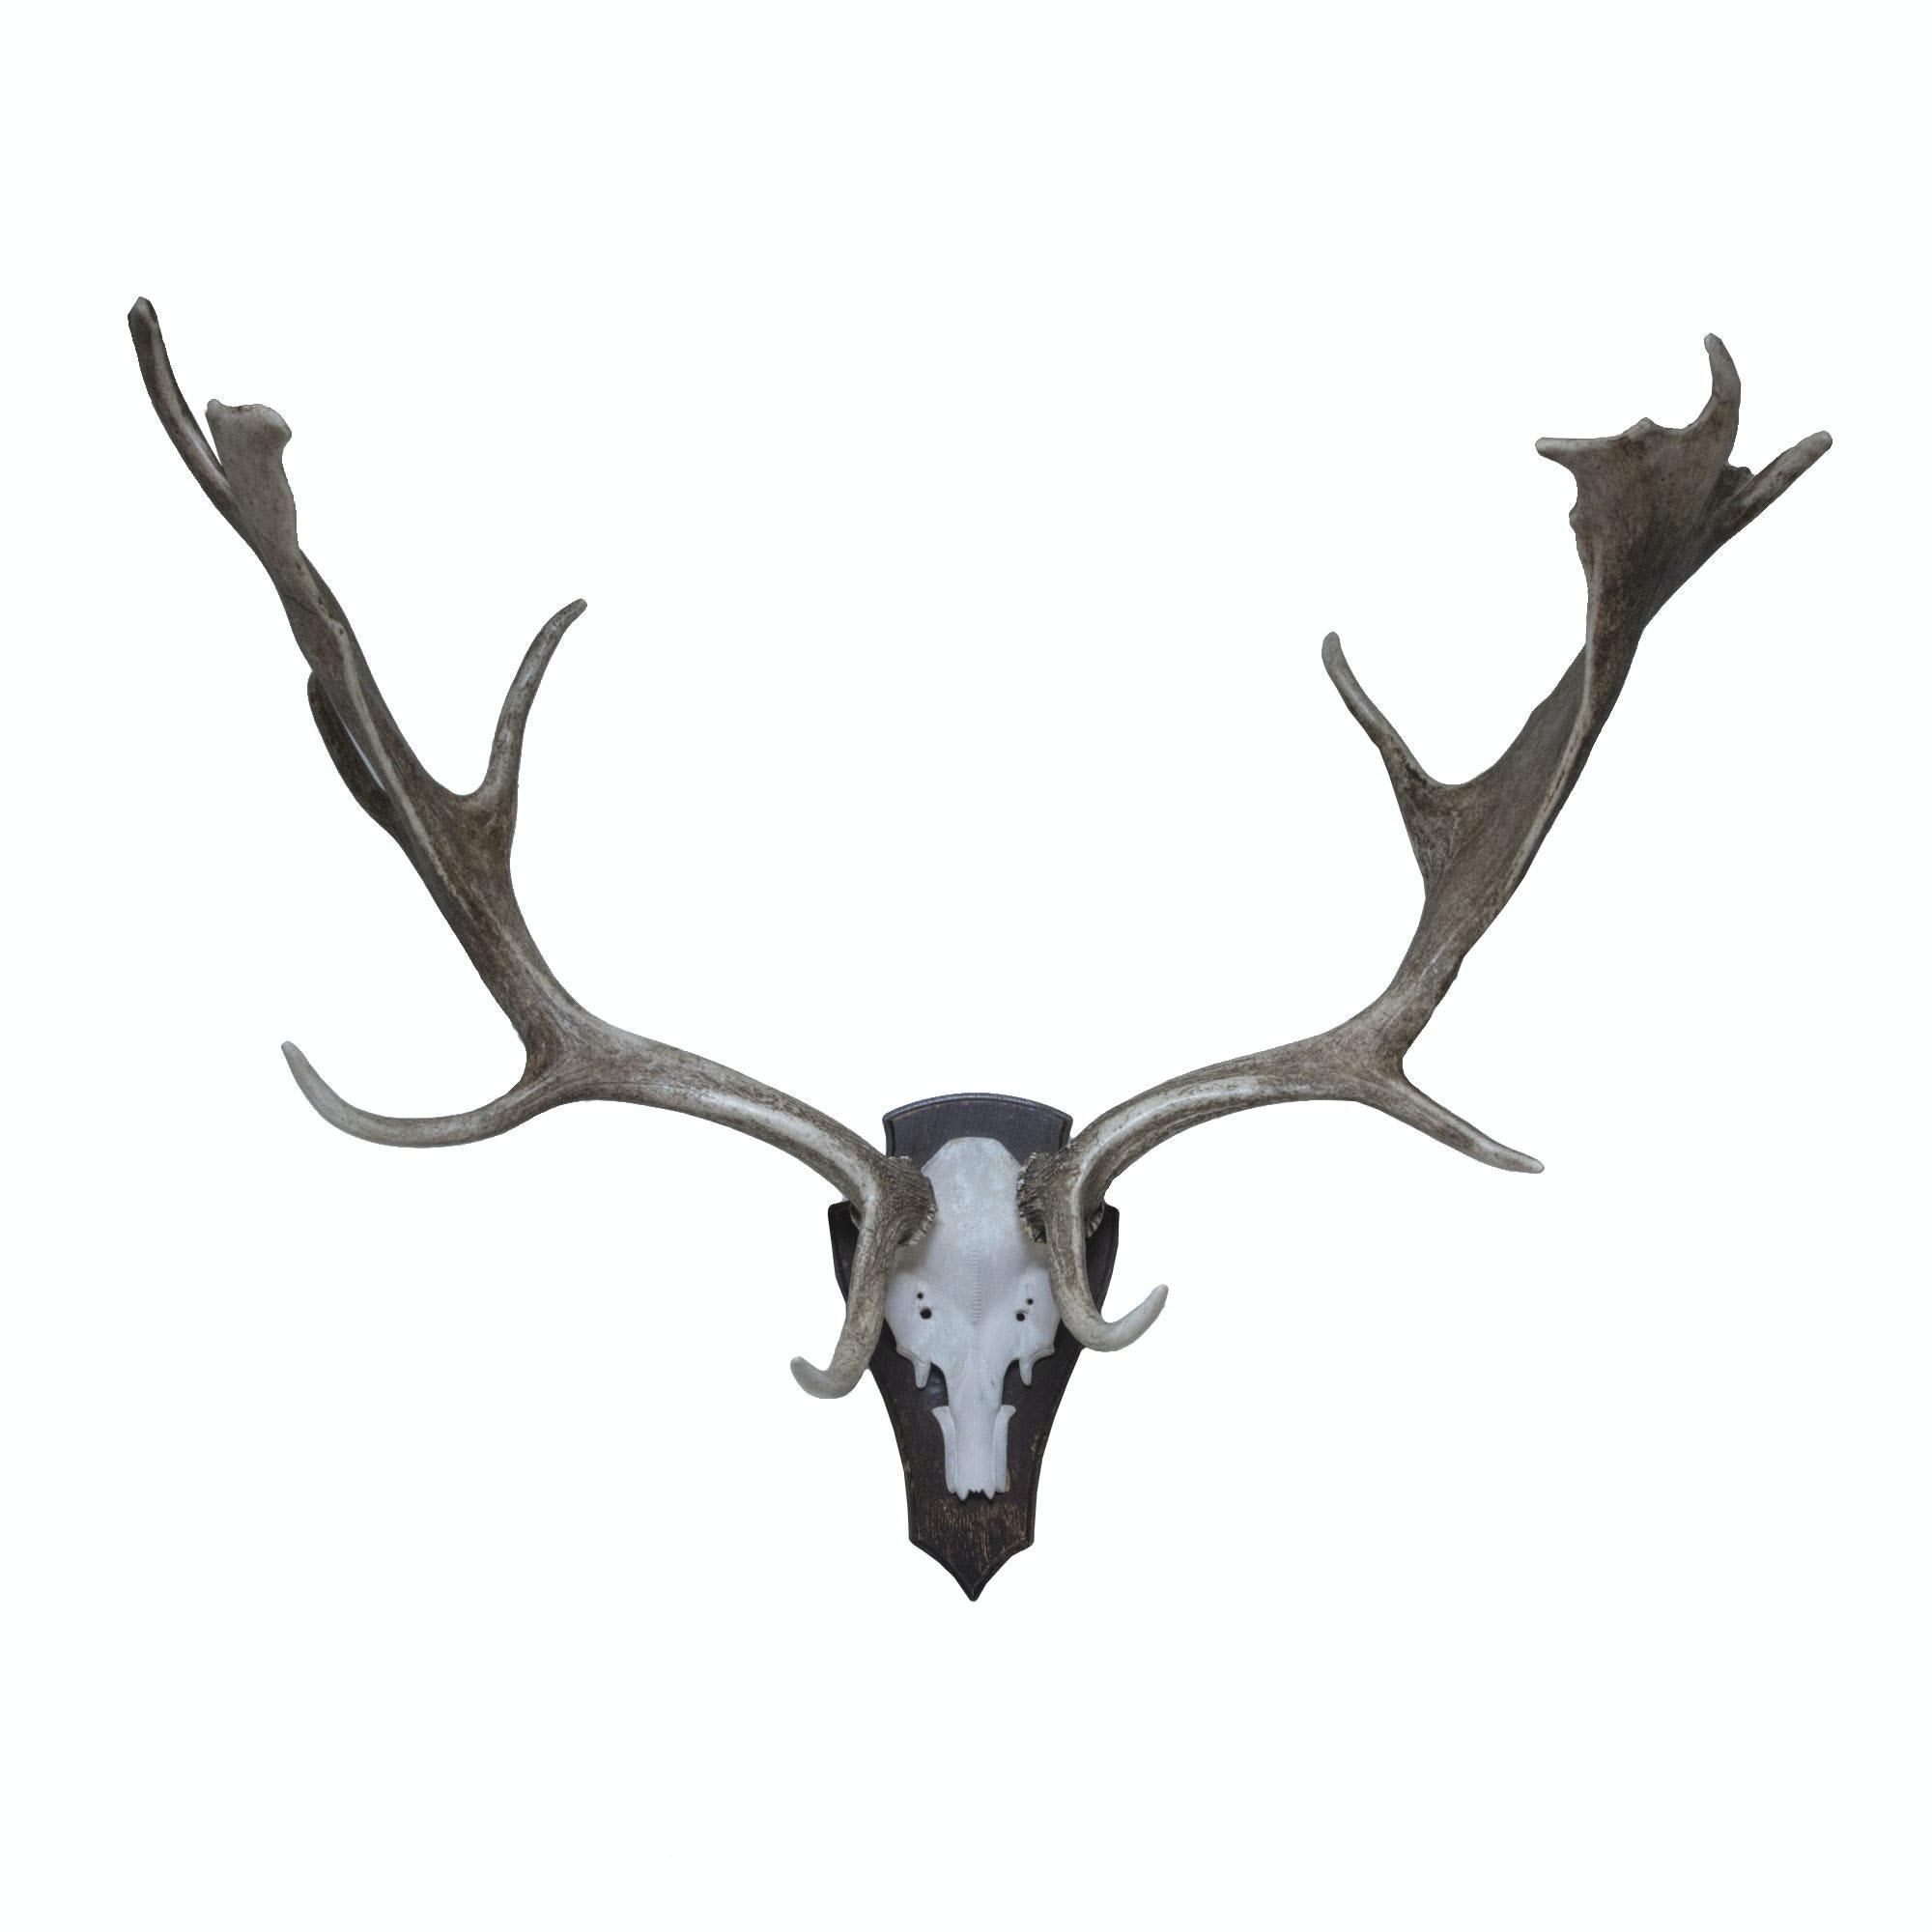 Mounted Fallow Deer Antlers